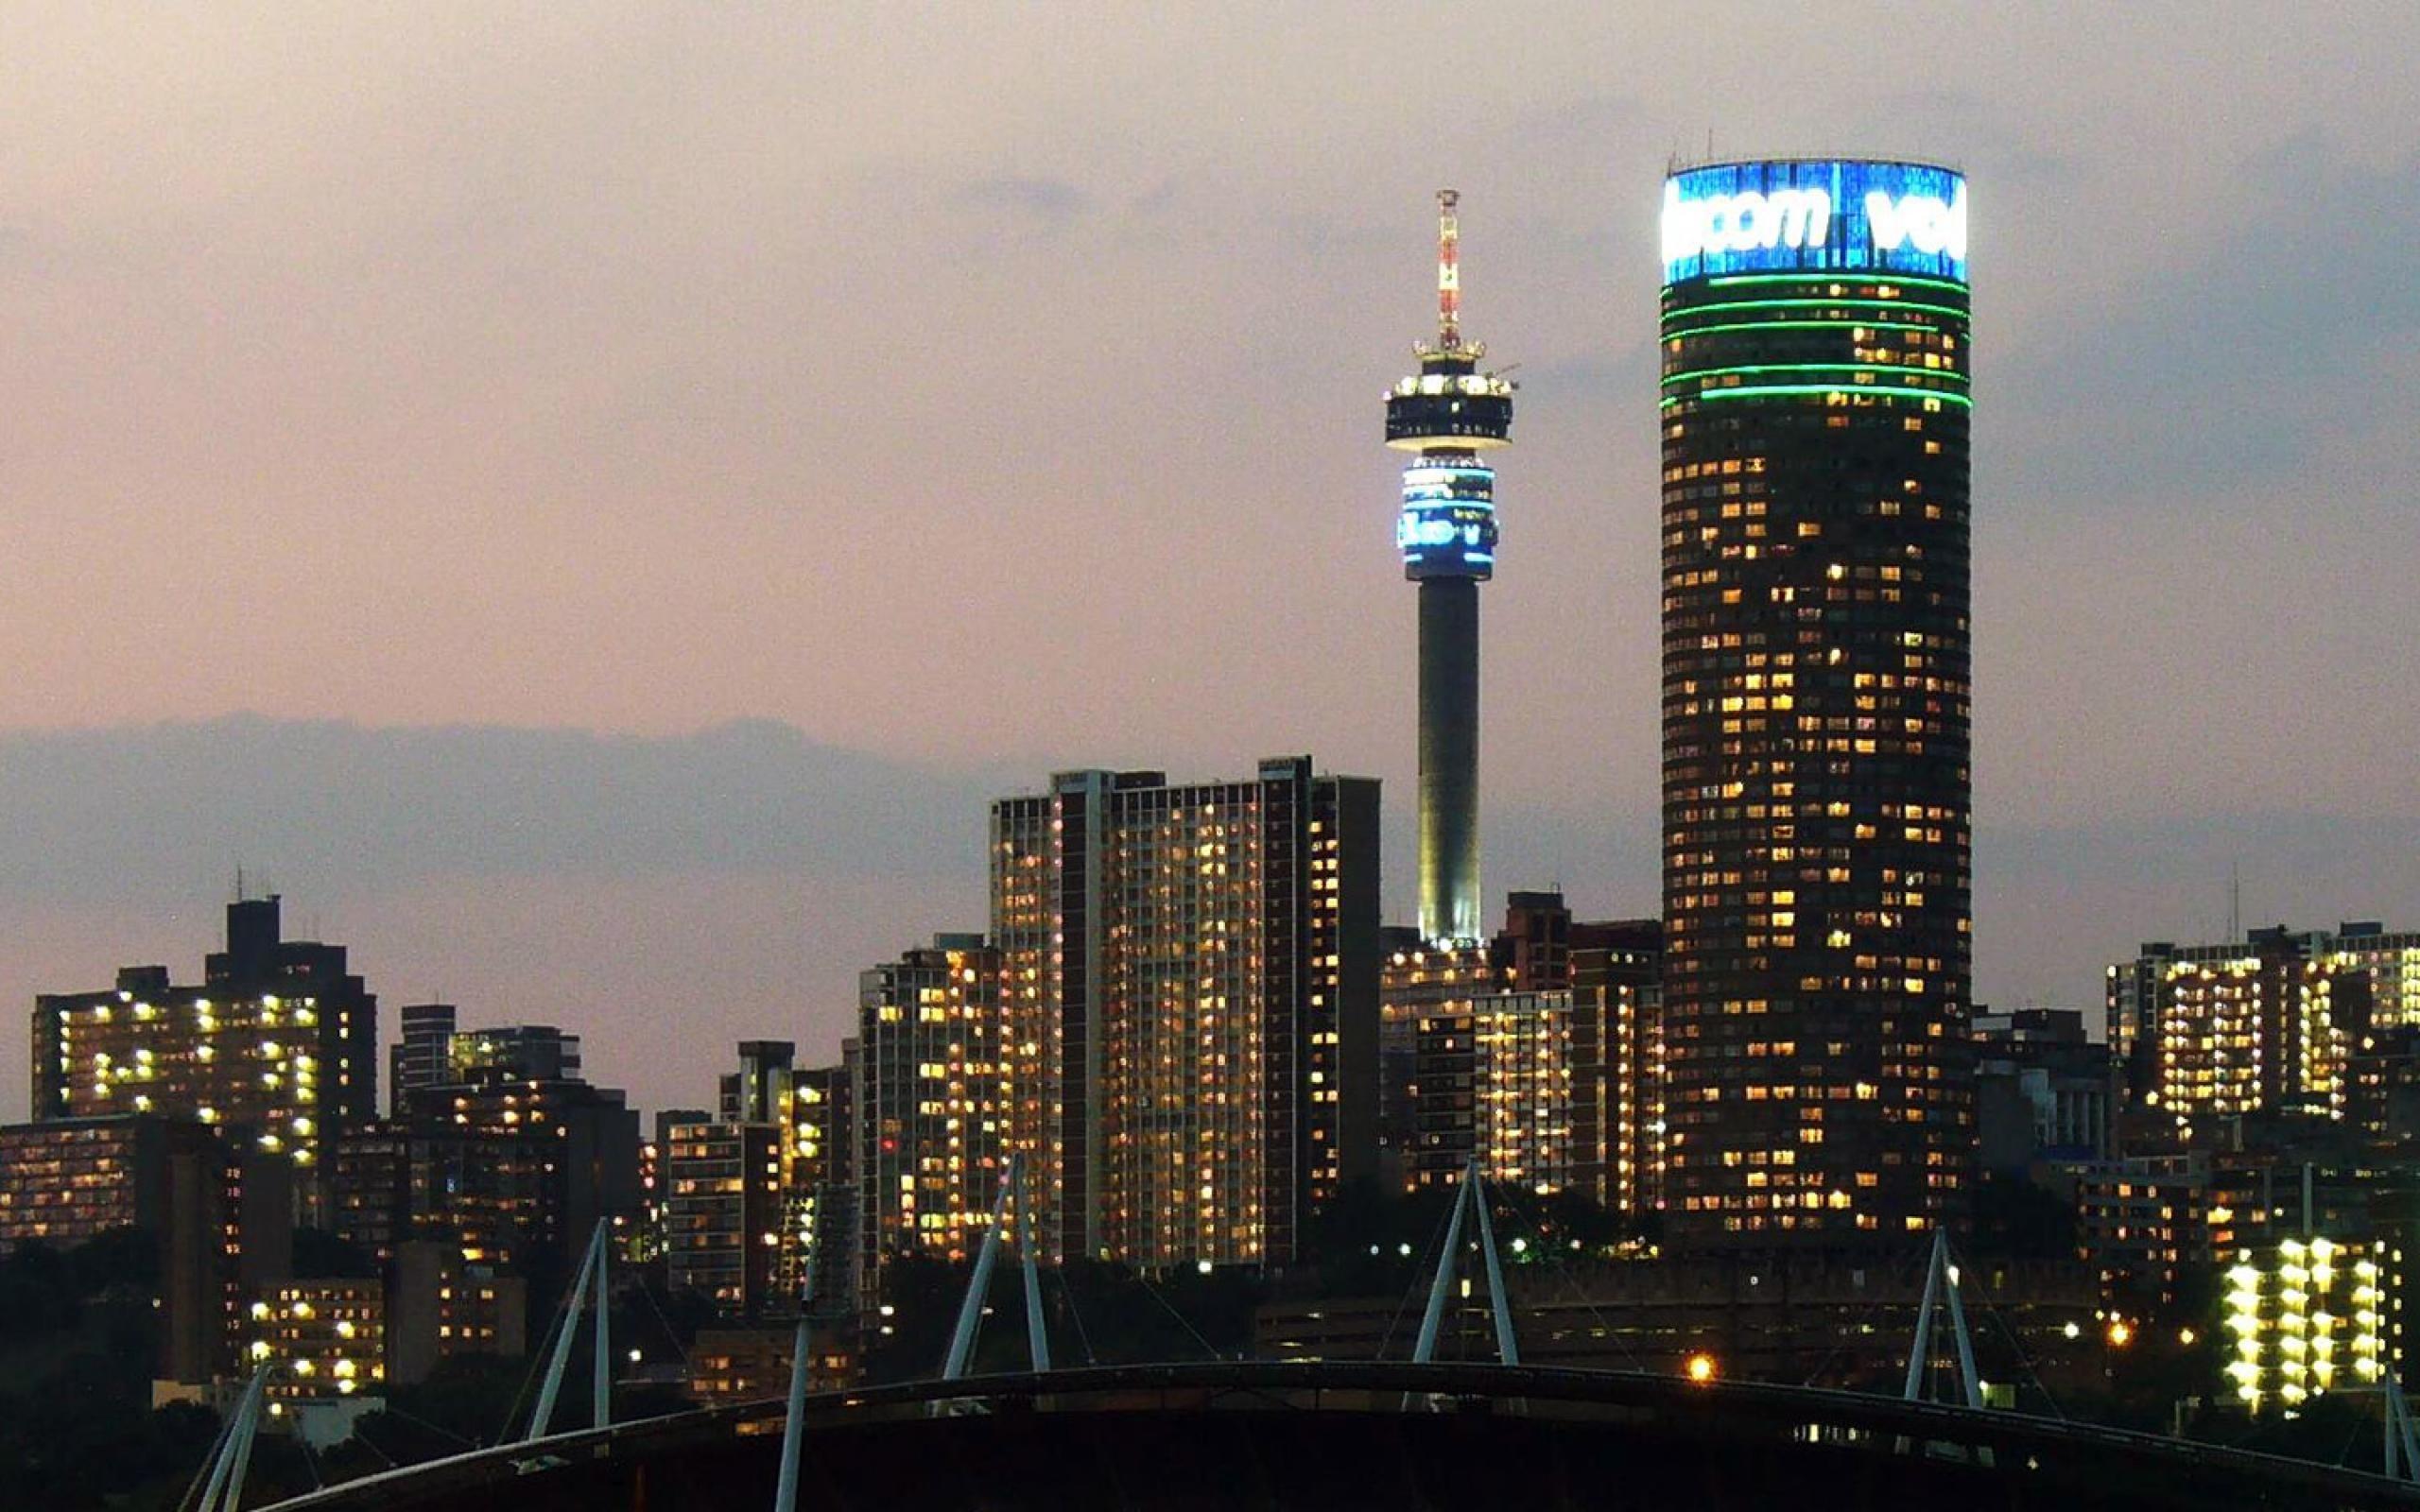 Johannesburg city lights south africa city photography wallpaper original resolution 2560x1600 altavistaventures Choice Image